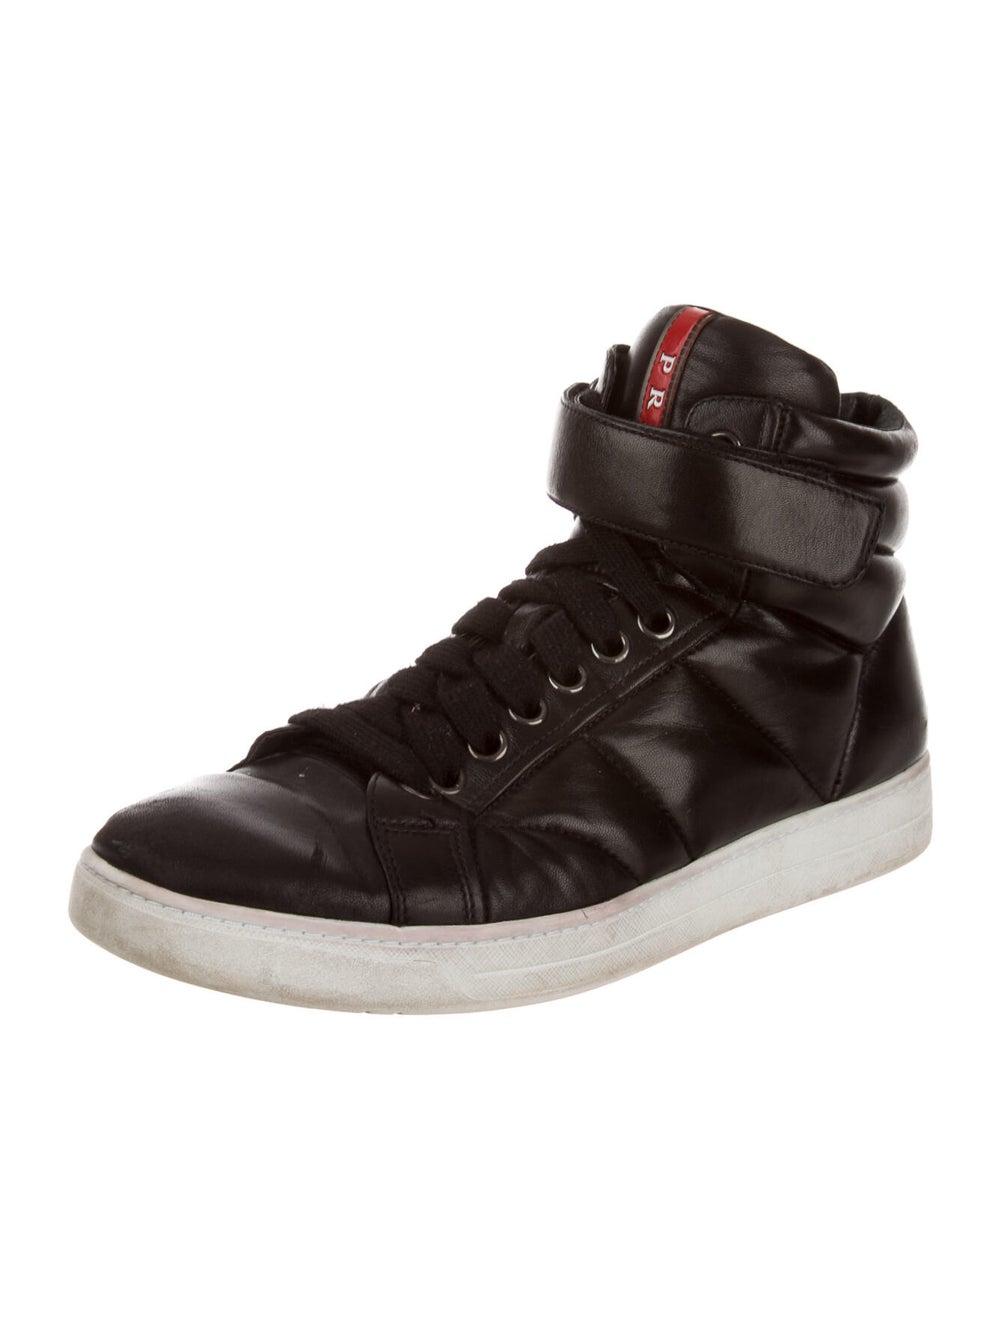 Prada Sport Leather Sneakers Black - image 2